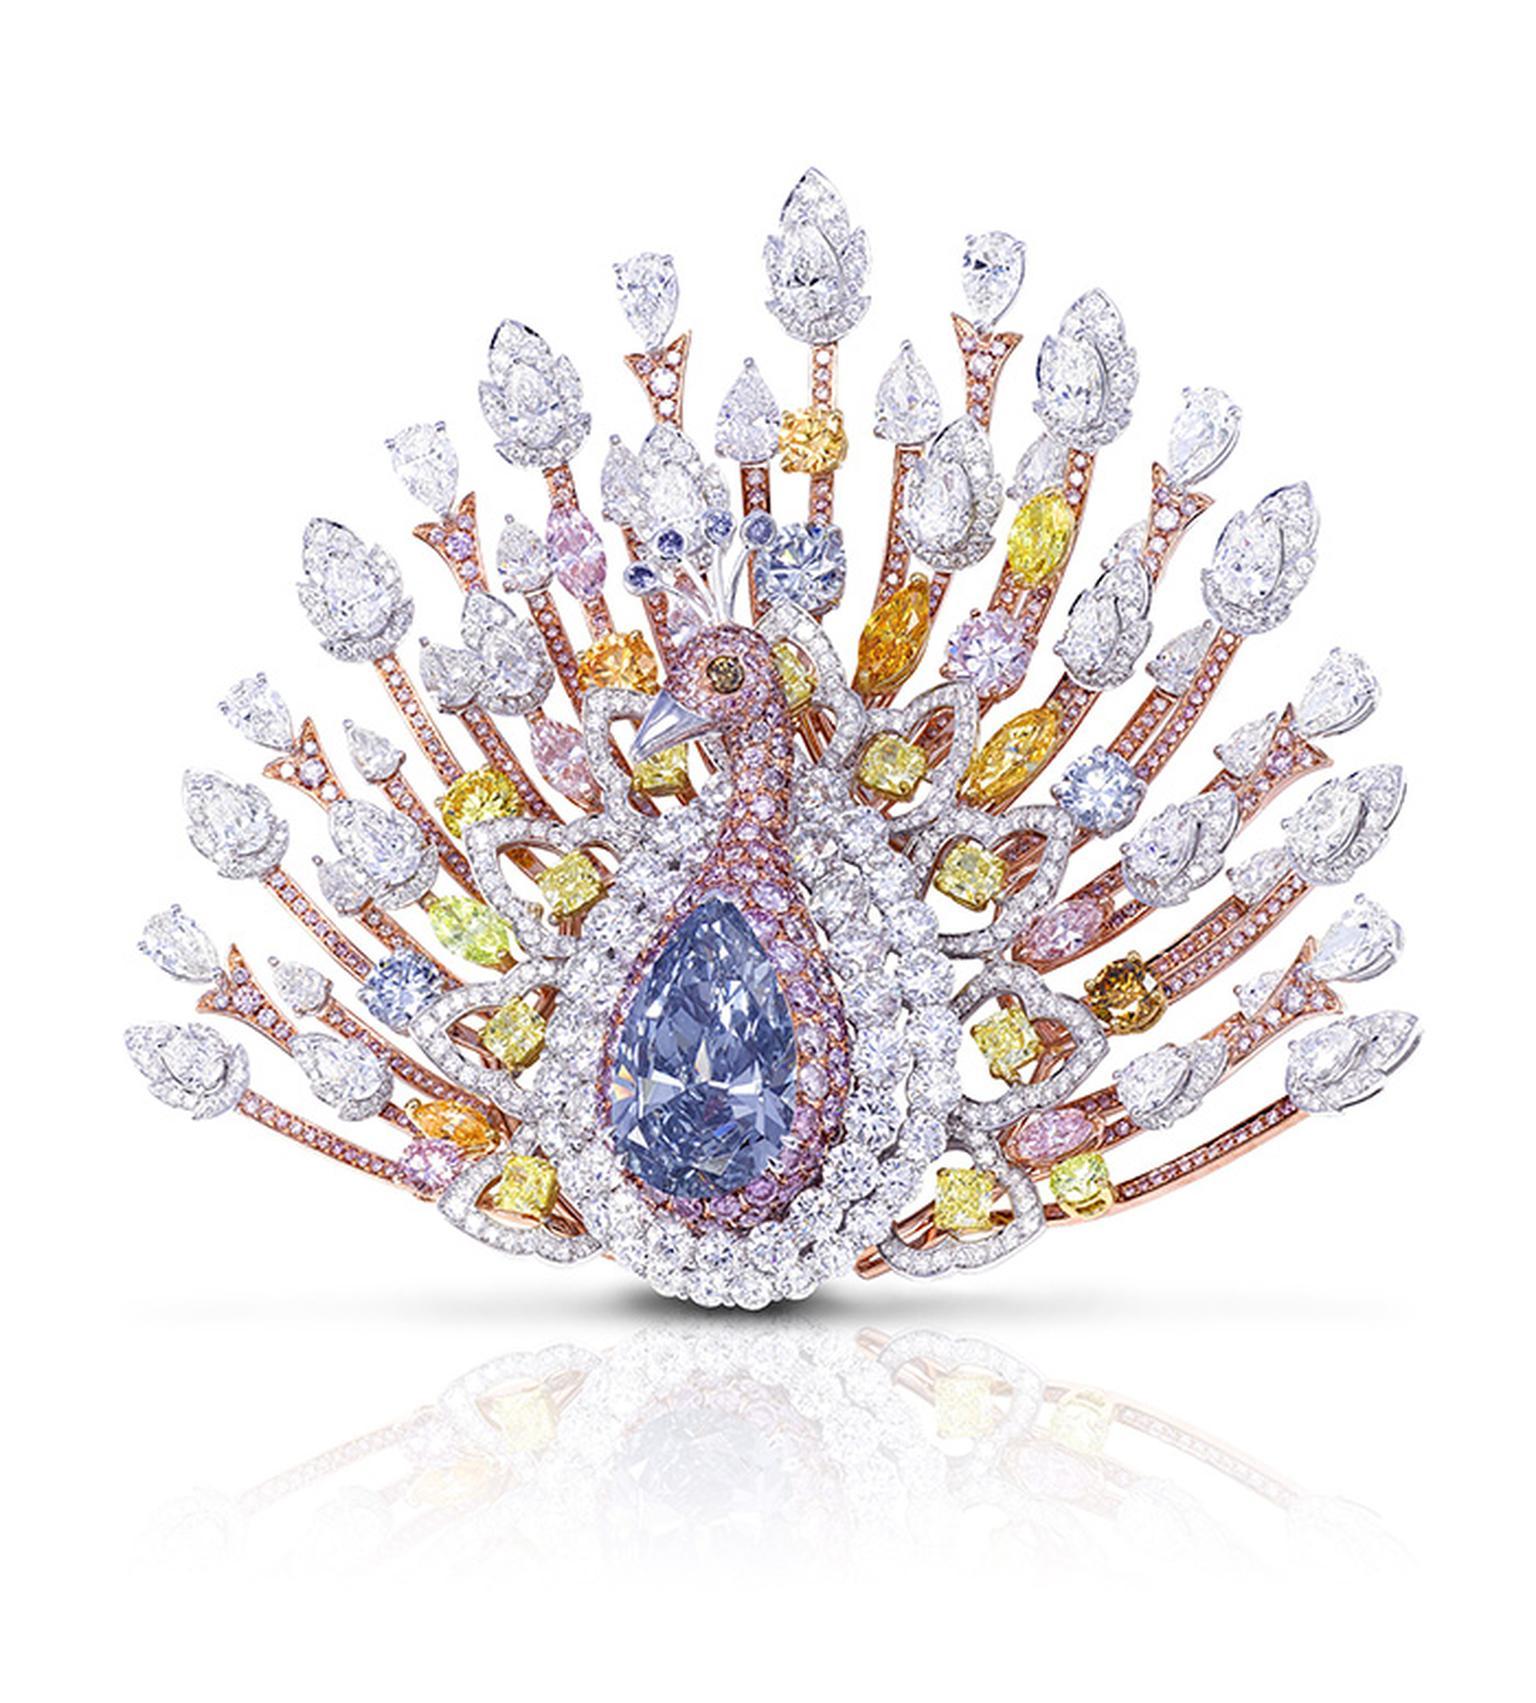 Graff Diamonds US$100 million peacock brooch | The Jewellery Editor